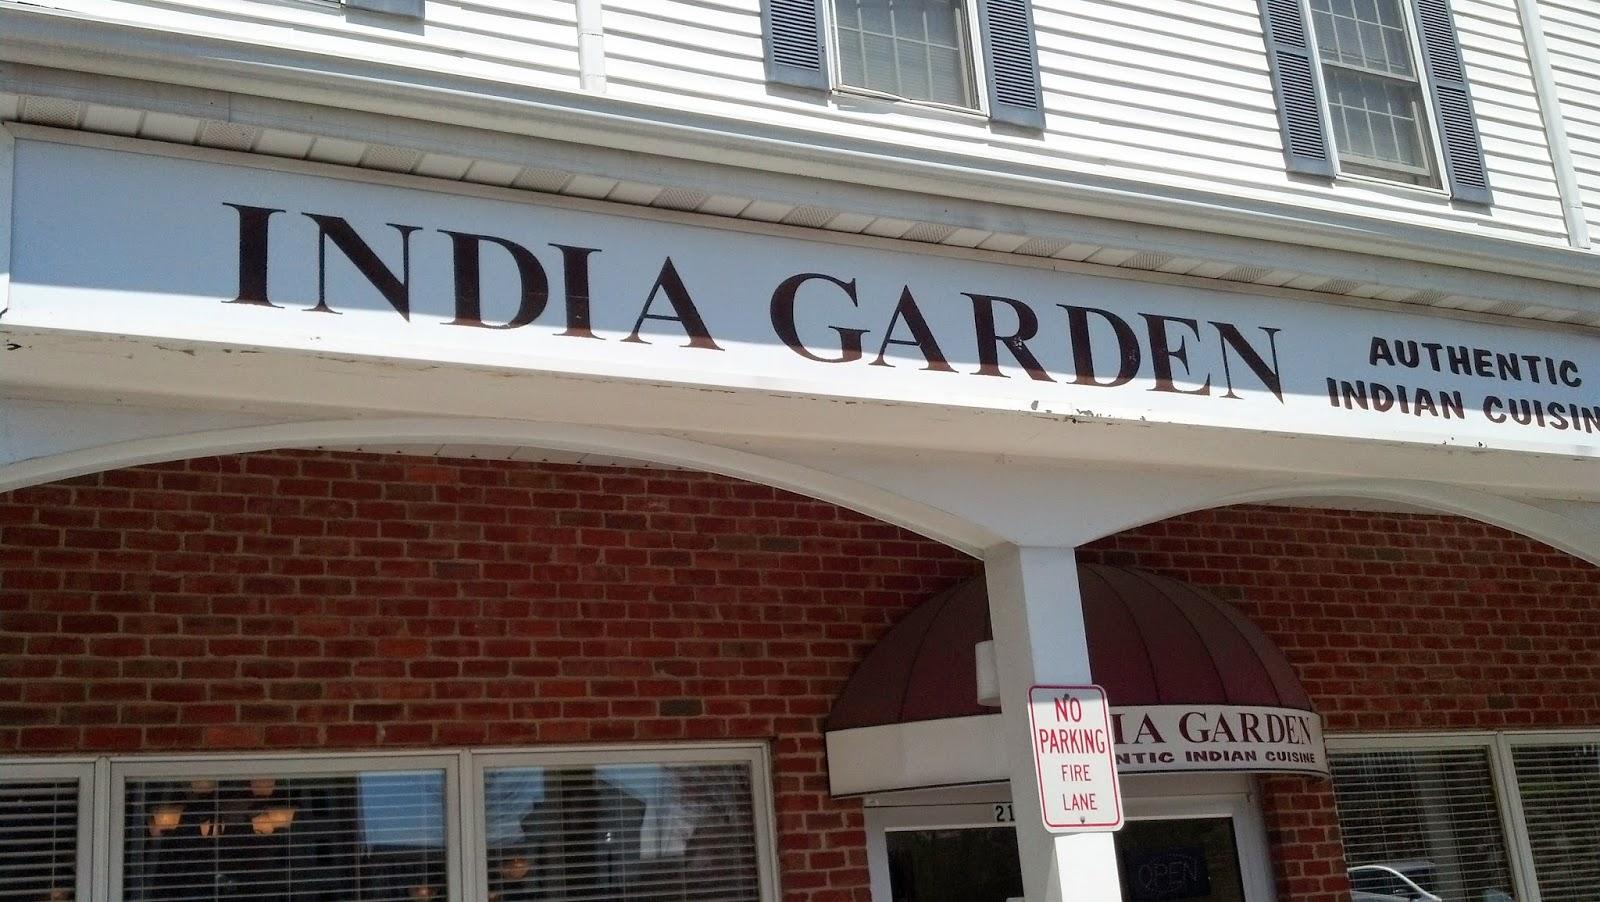 blacksburg va india garden - India Garden Blacksburg